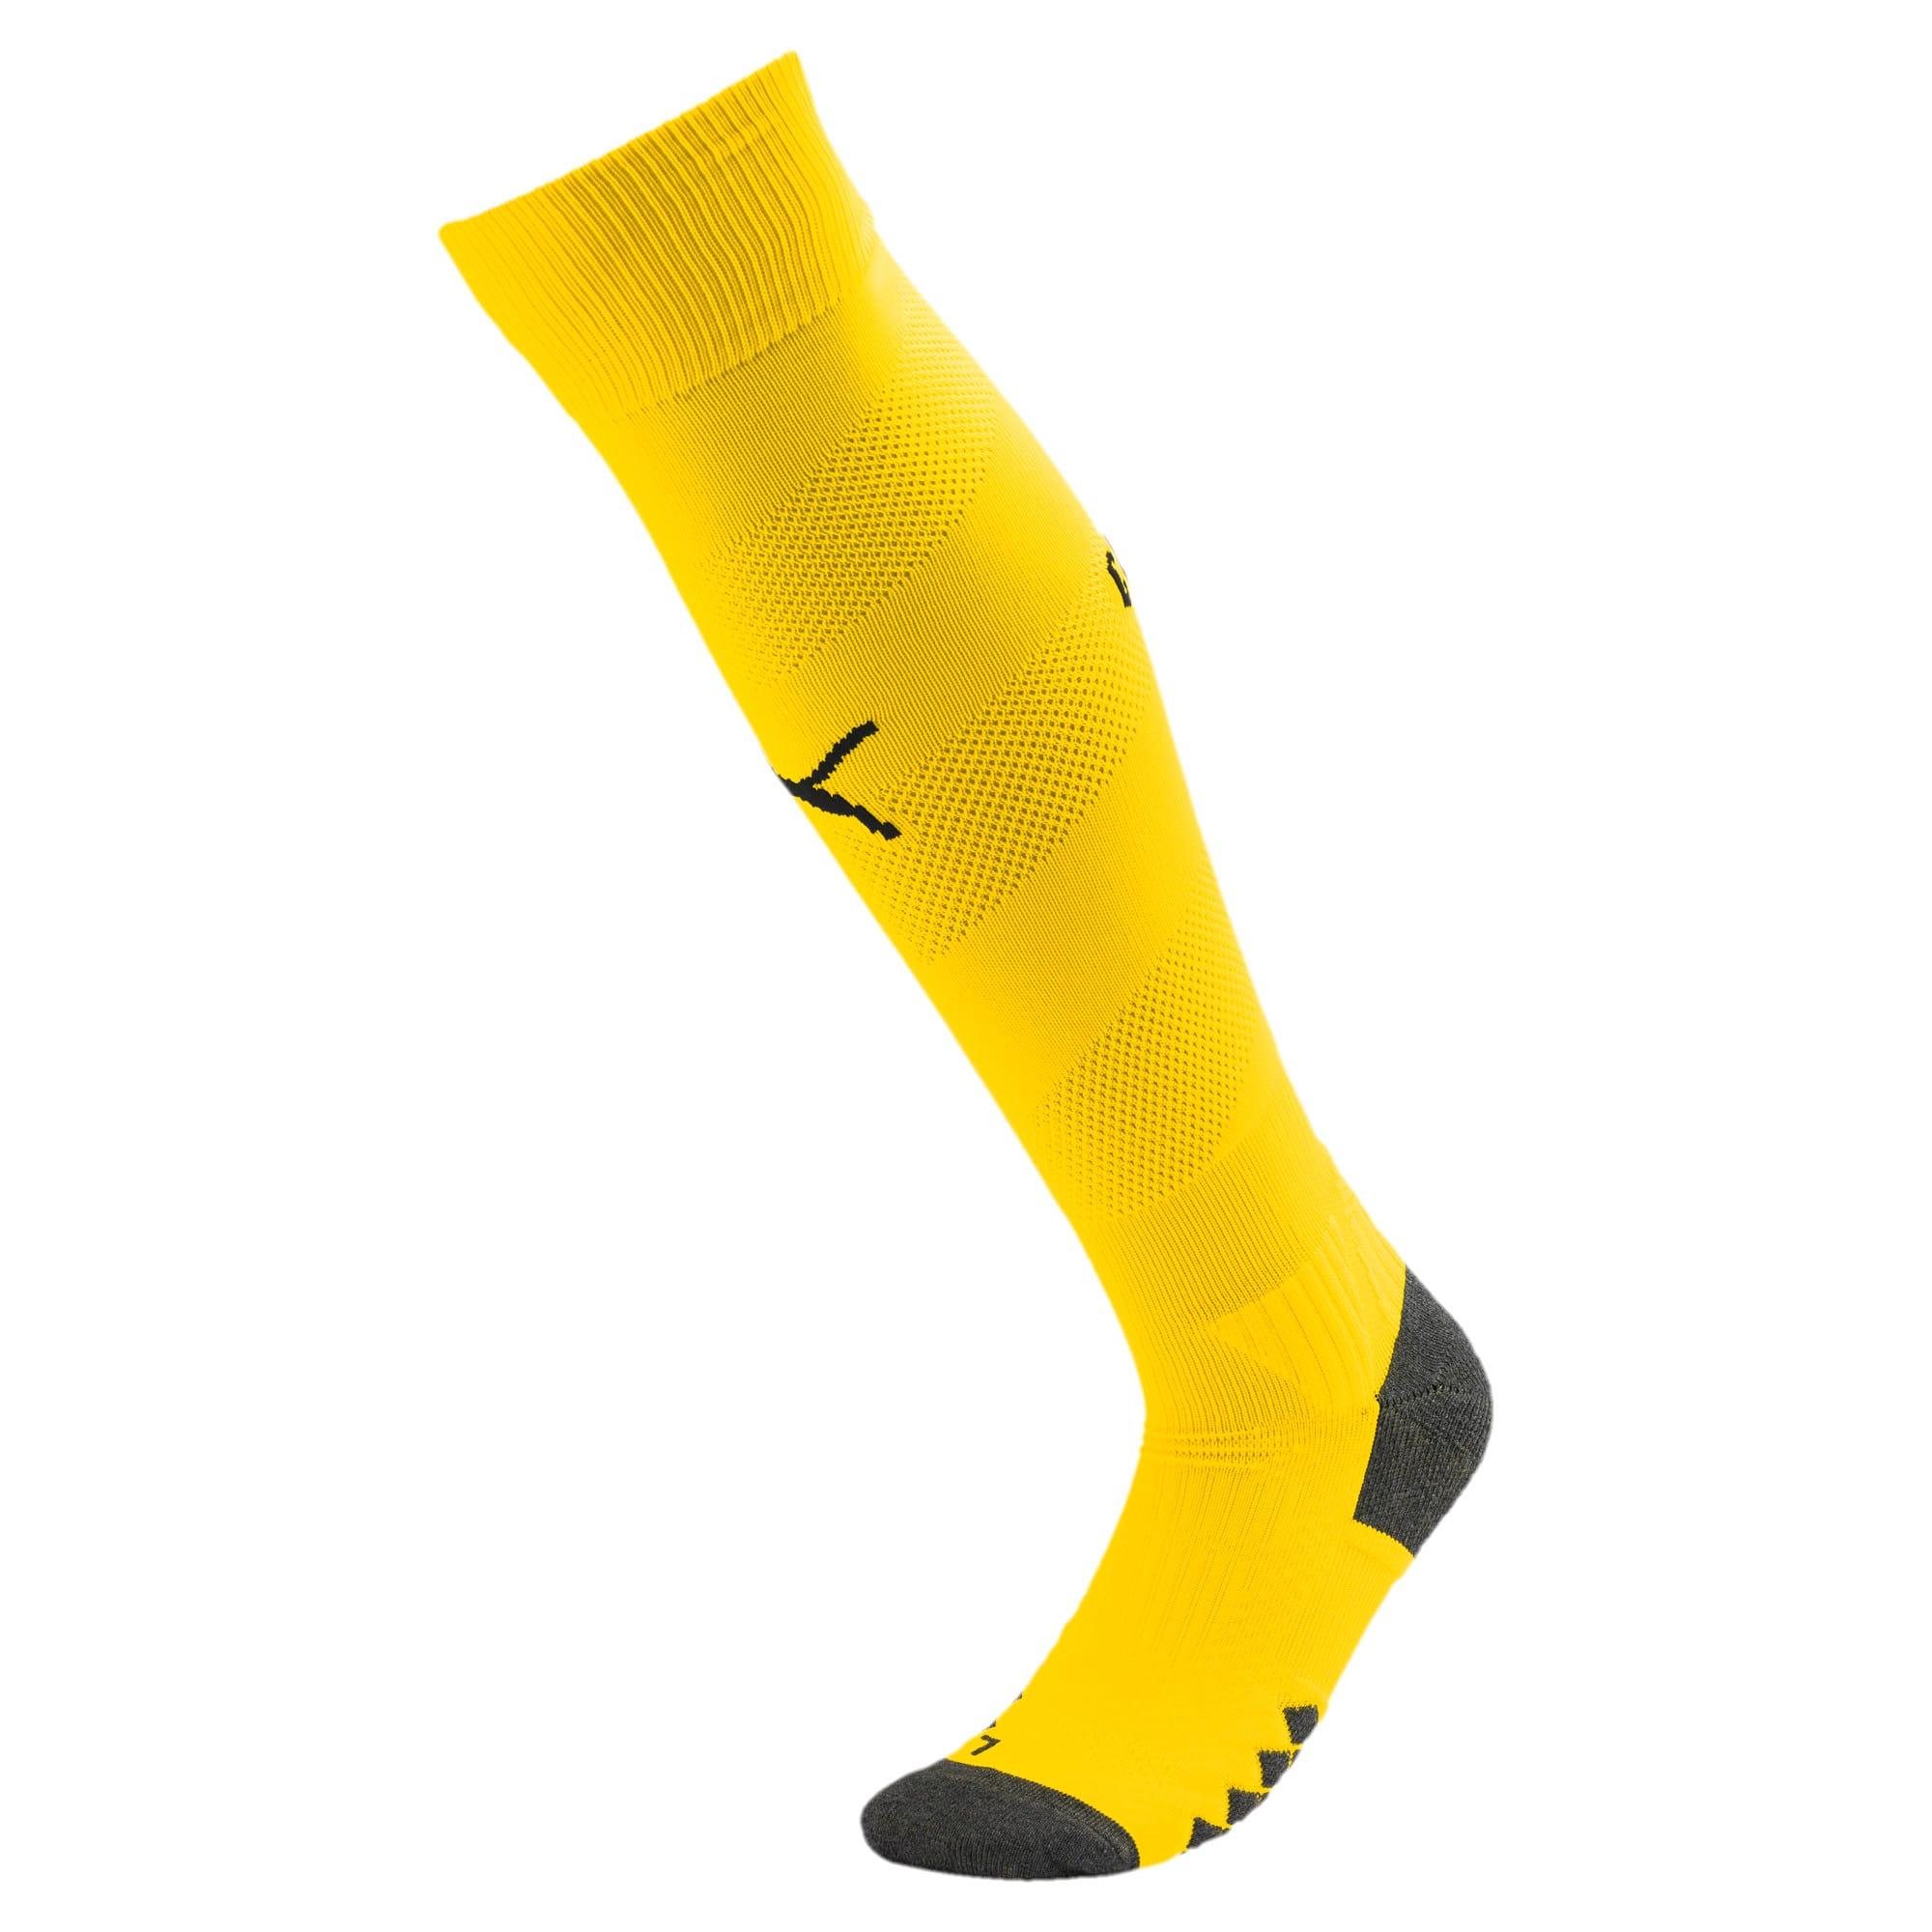 Thumbnail 1 of Man City Spiral Men's Socks, Cyber Yellow-Puma Black, medium